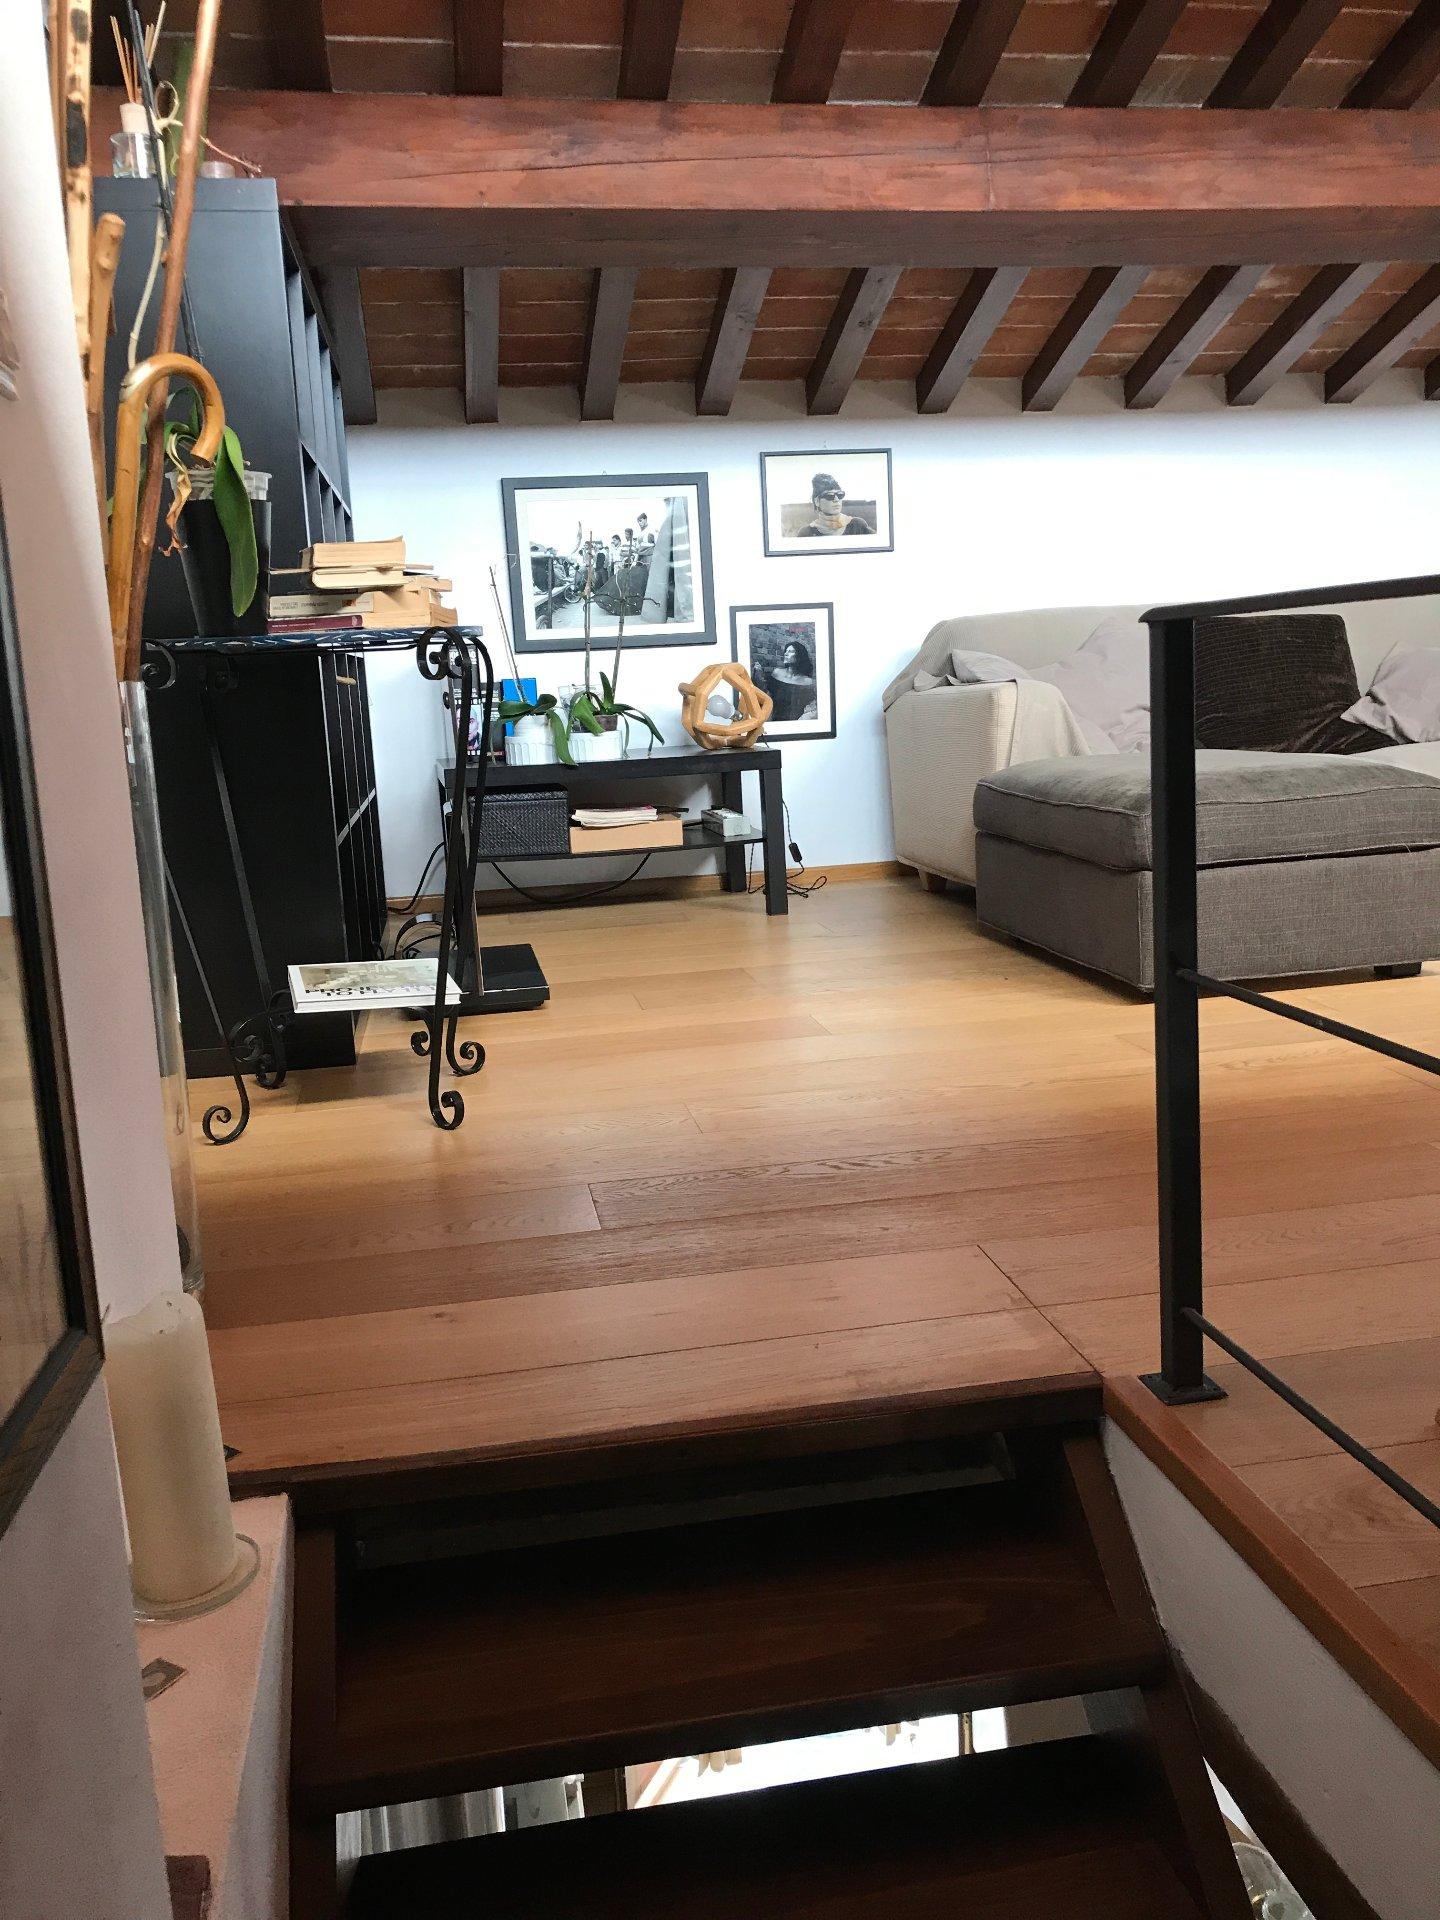 Appartamento in affitto, rif. 266af